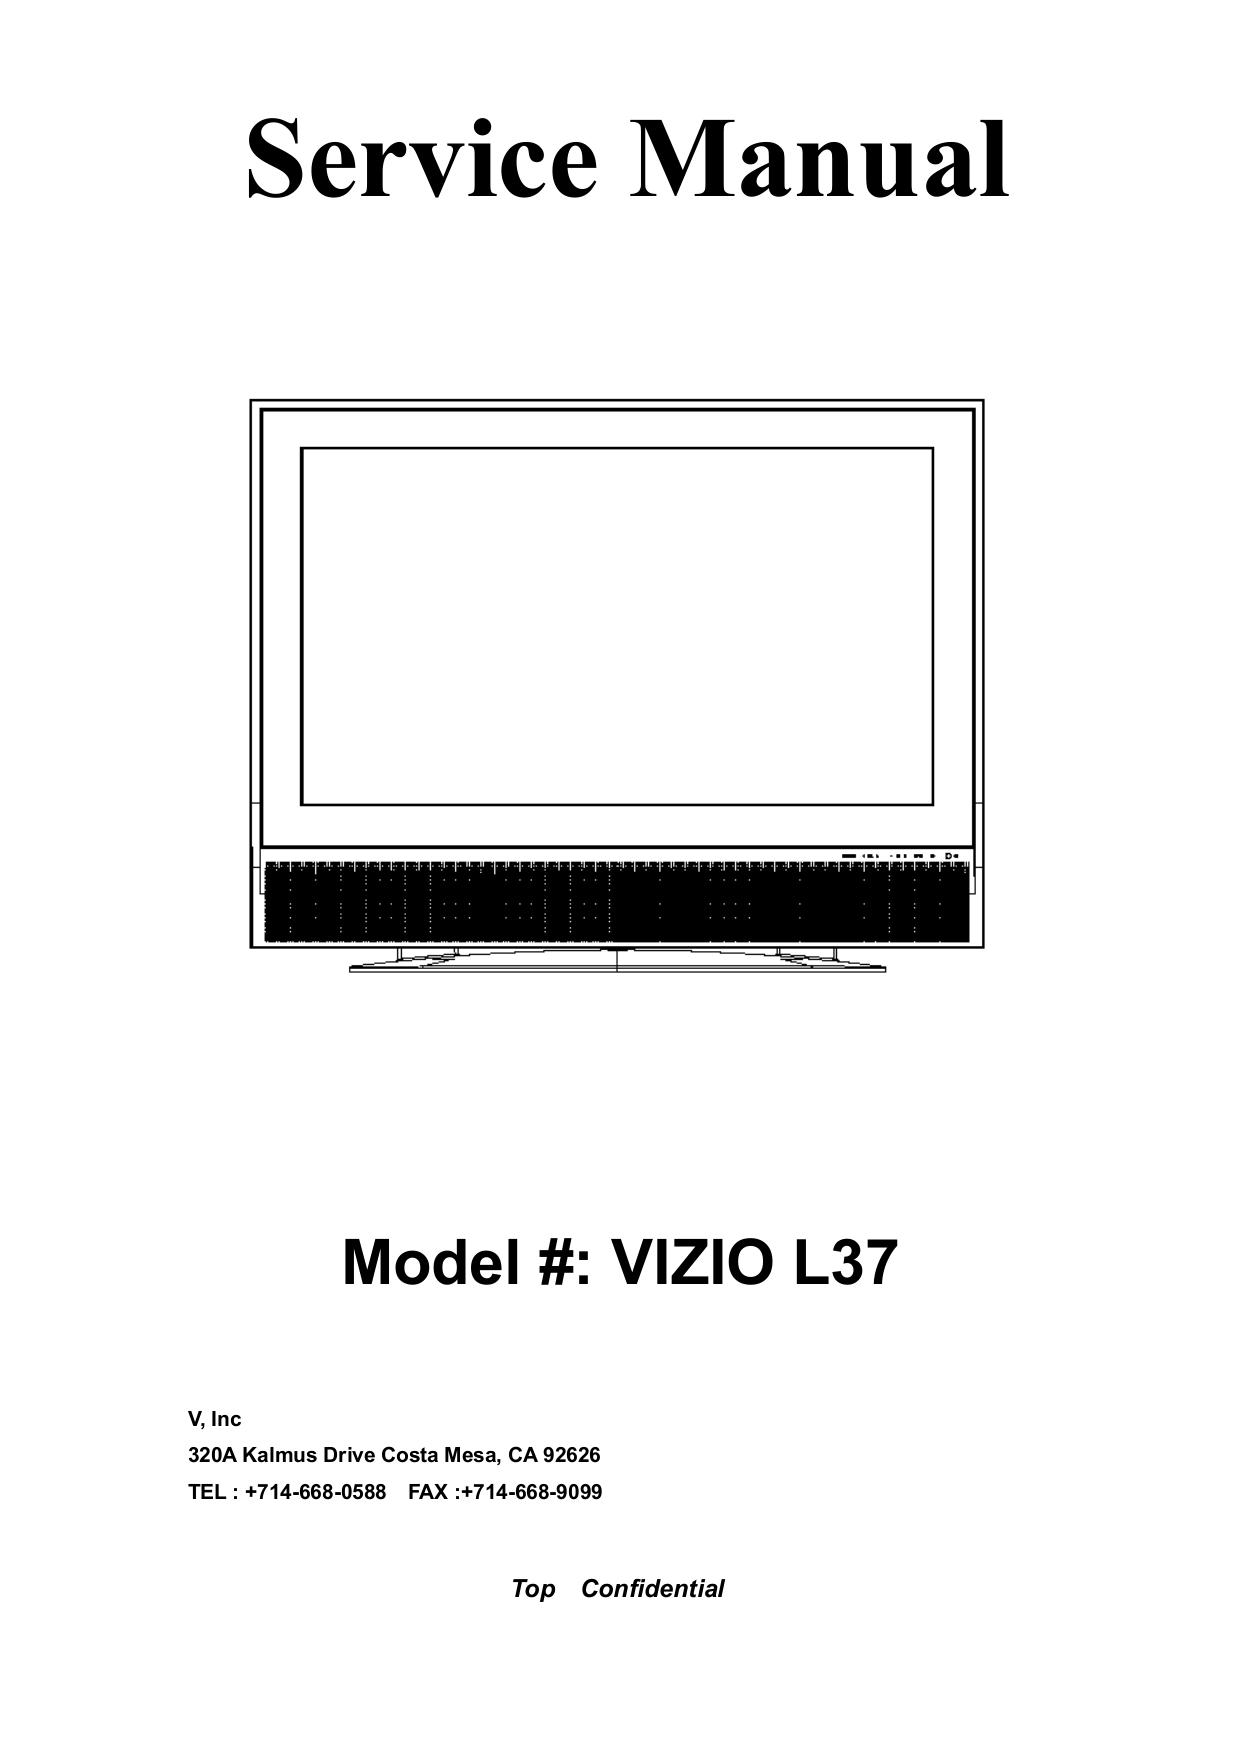 download free pdf for vizio vf550m tv manual rh umlib com Vizio 55 Flat Screen TV Vizio 55-Inch TV